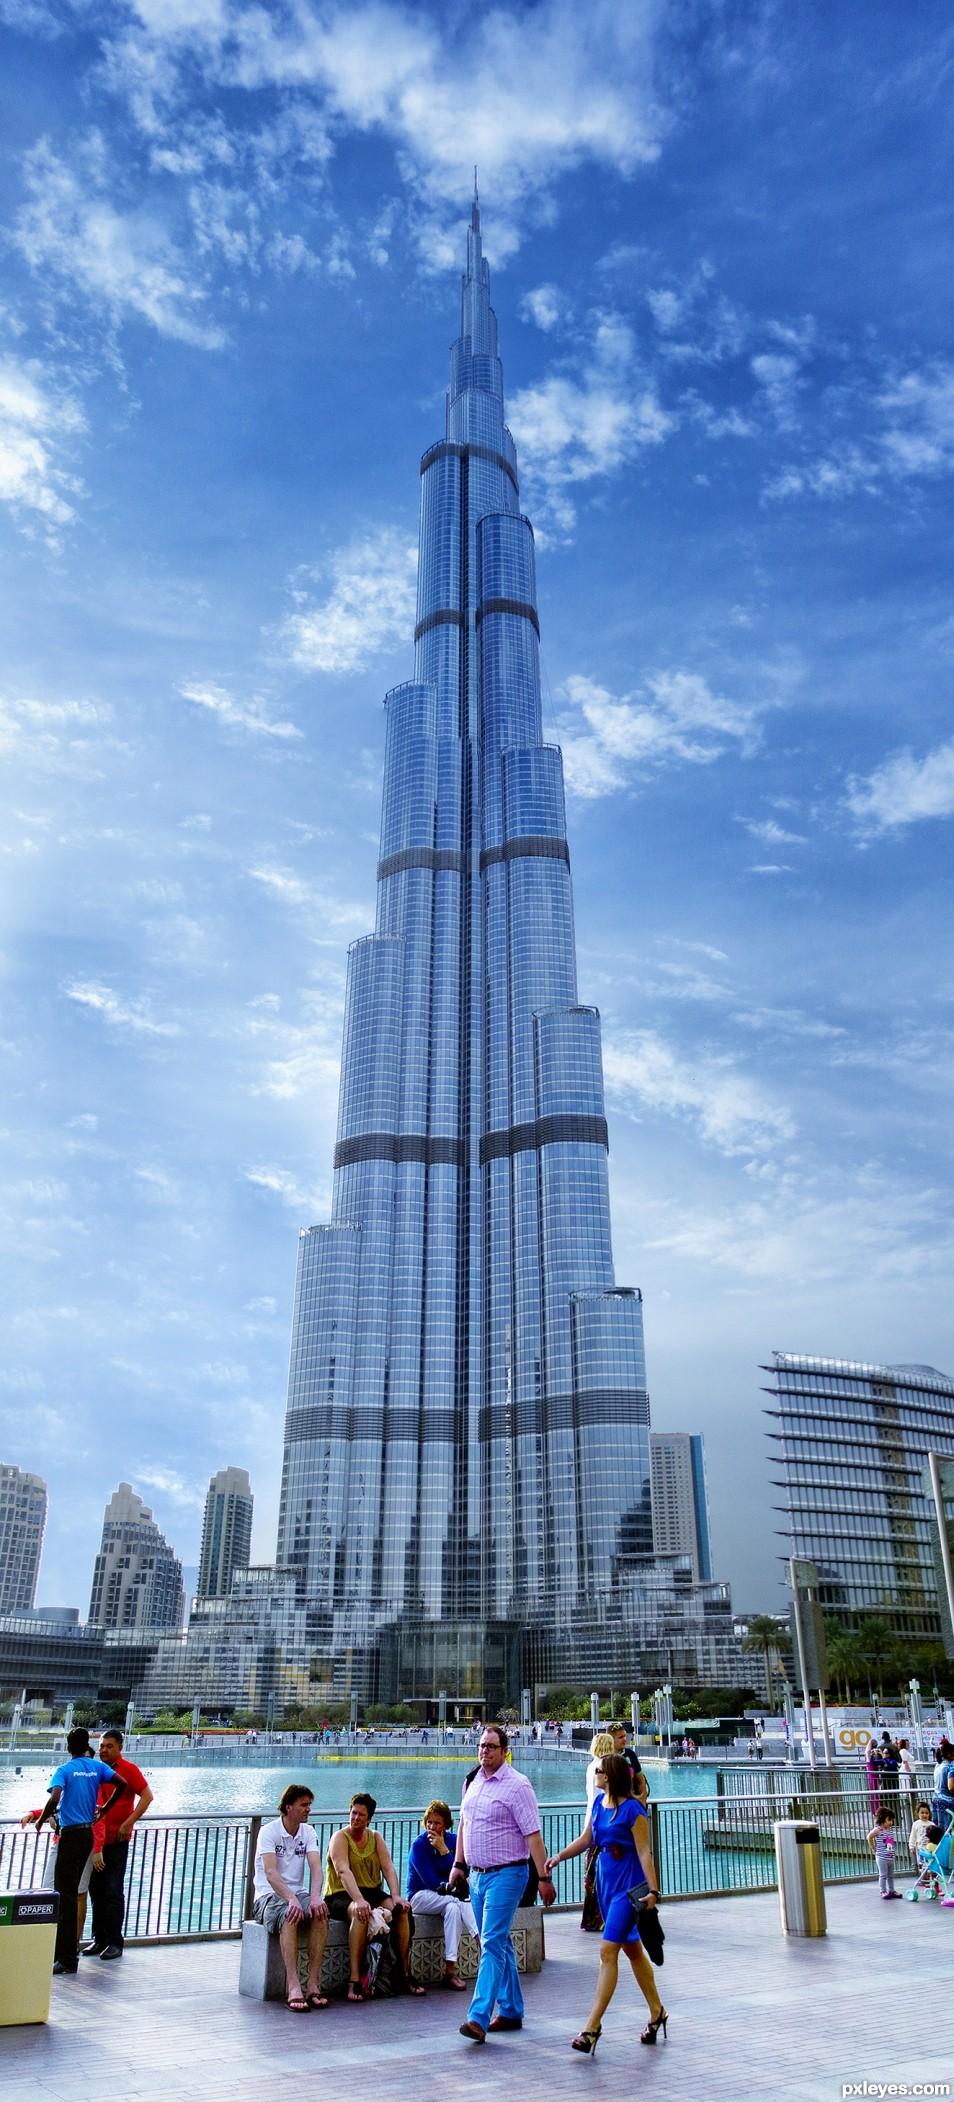 Worlds largest - Burj Al khalifa